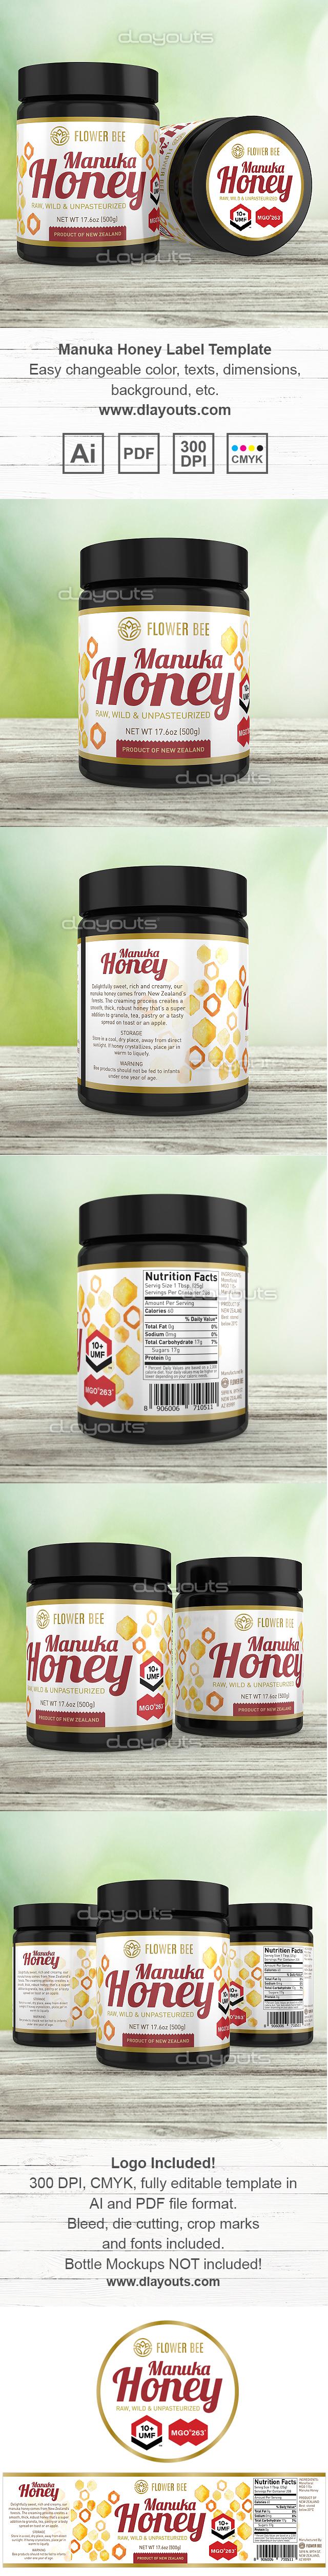 Manuka Honey Label Template